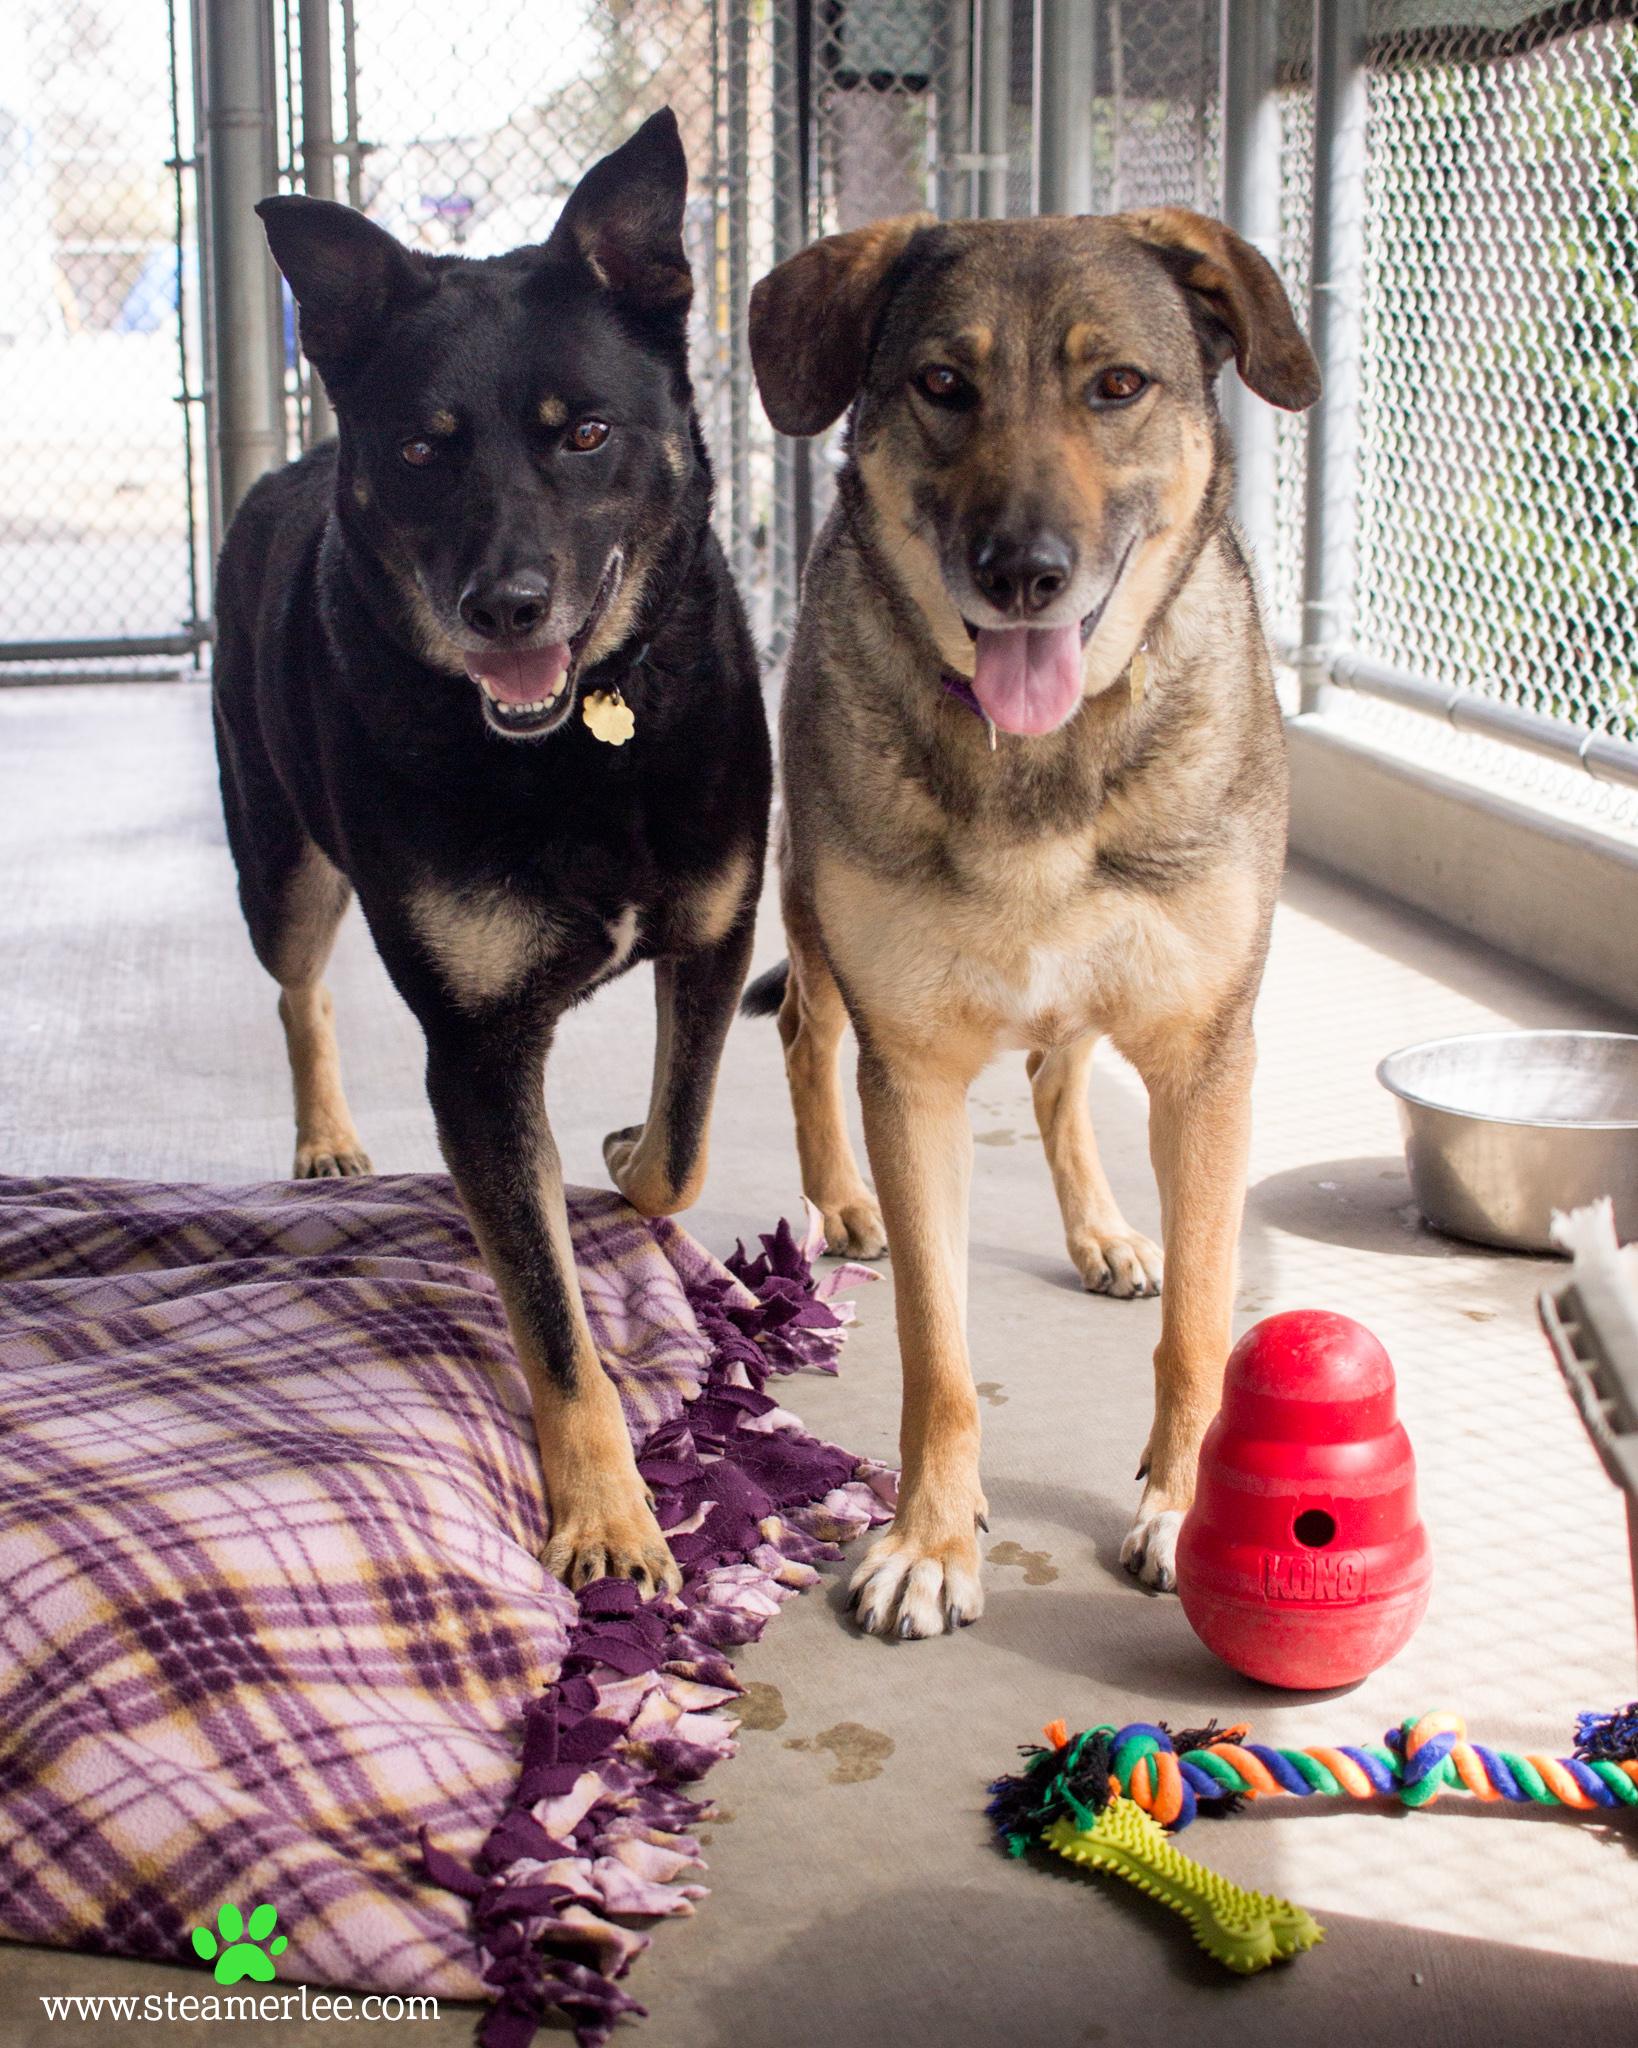 199 Orange County Dog Photography - Steamer Lee - Southern California.JPG